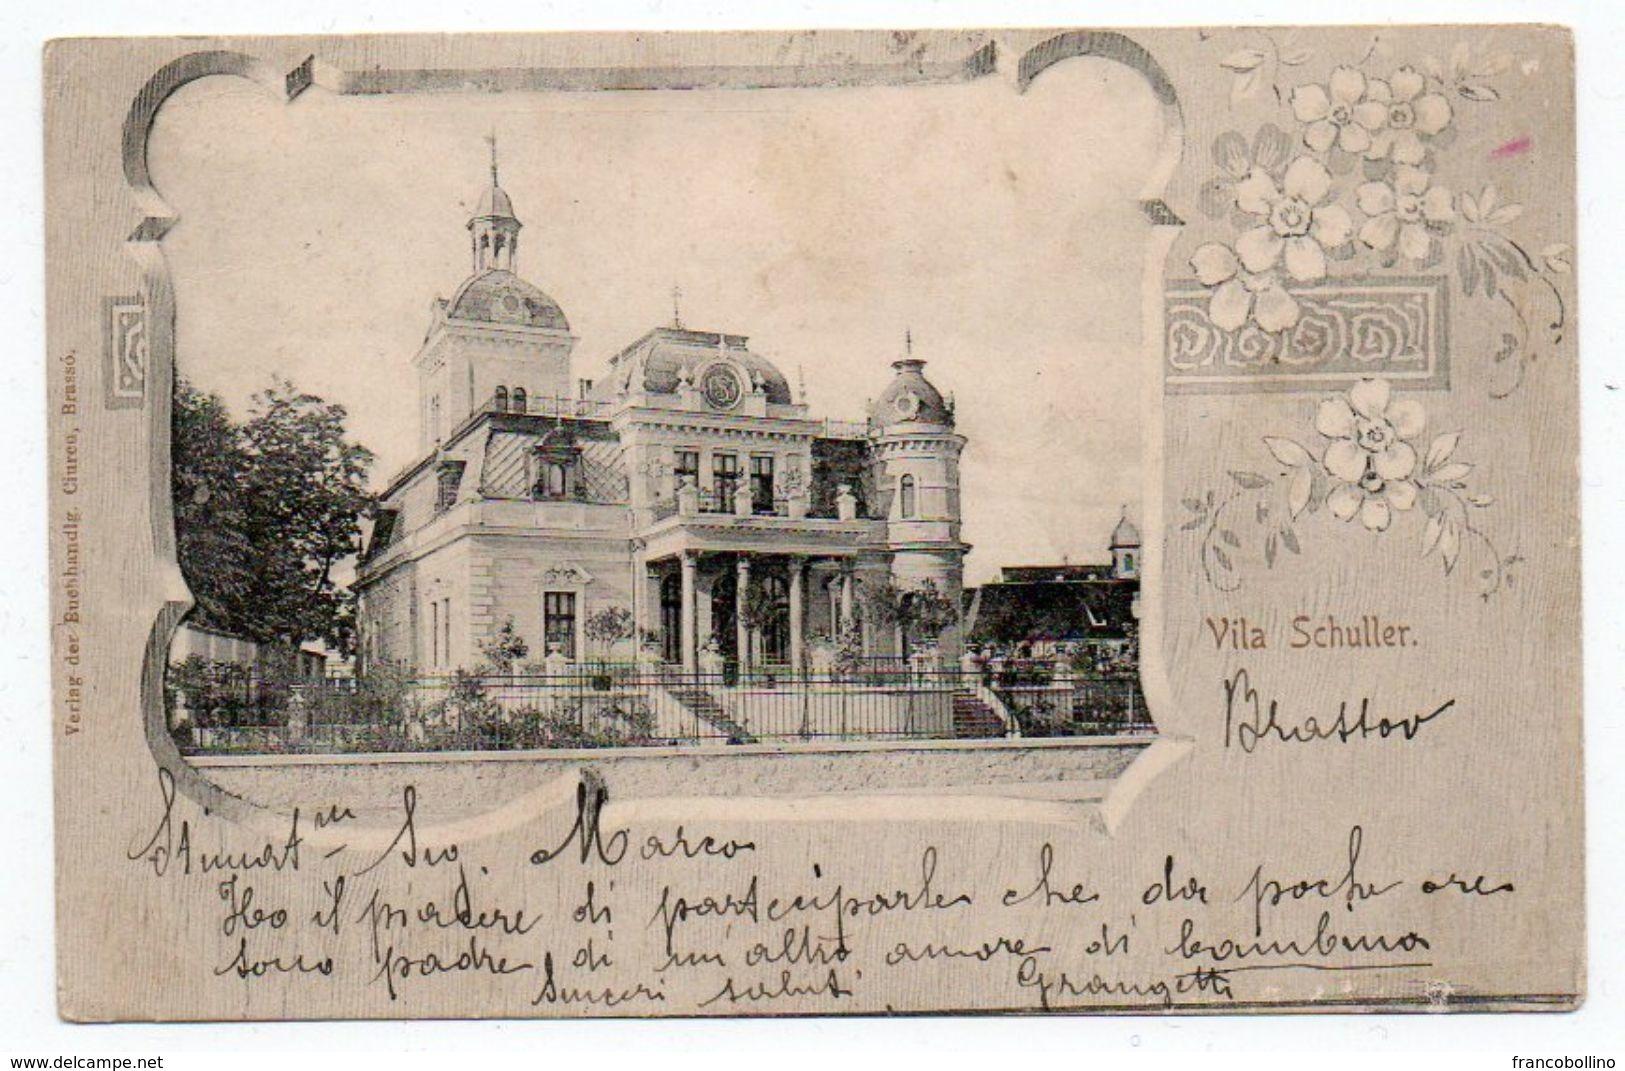 ROMANIA/ROUMANIE - KRONSTADT/BRASSO'/BRASOV - VILA SCHULLER - OLD LITHO - Romania